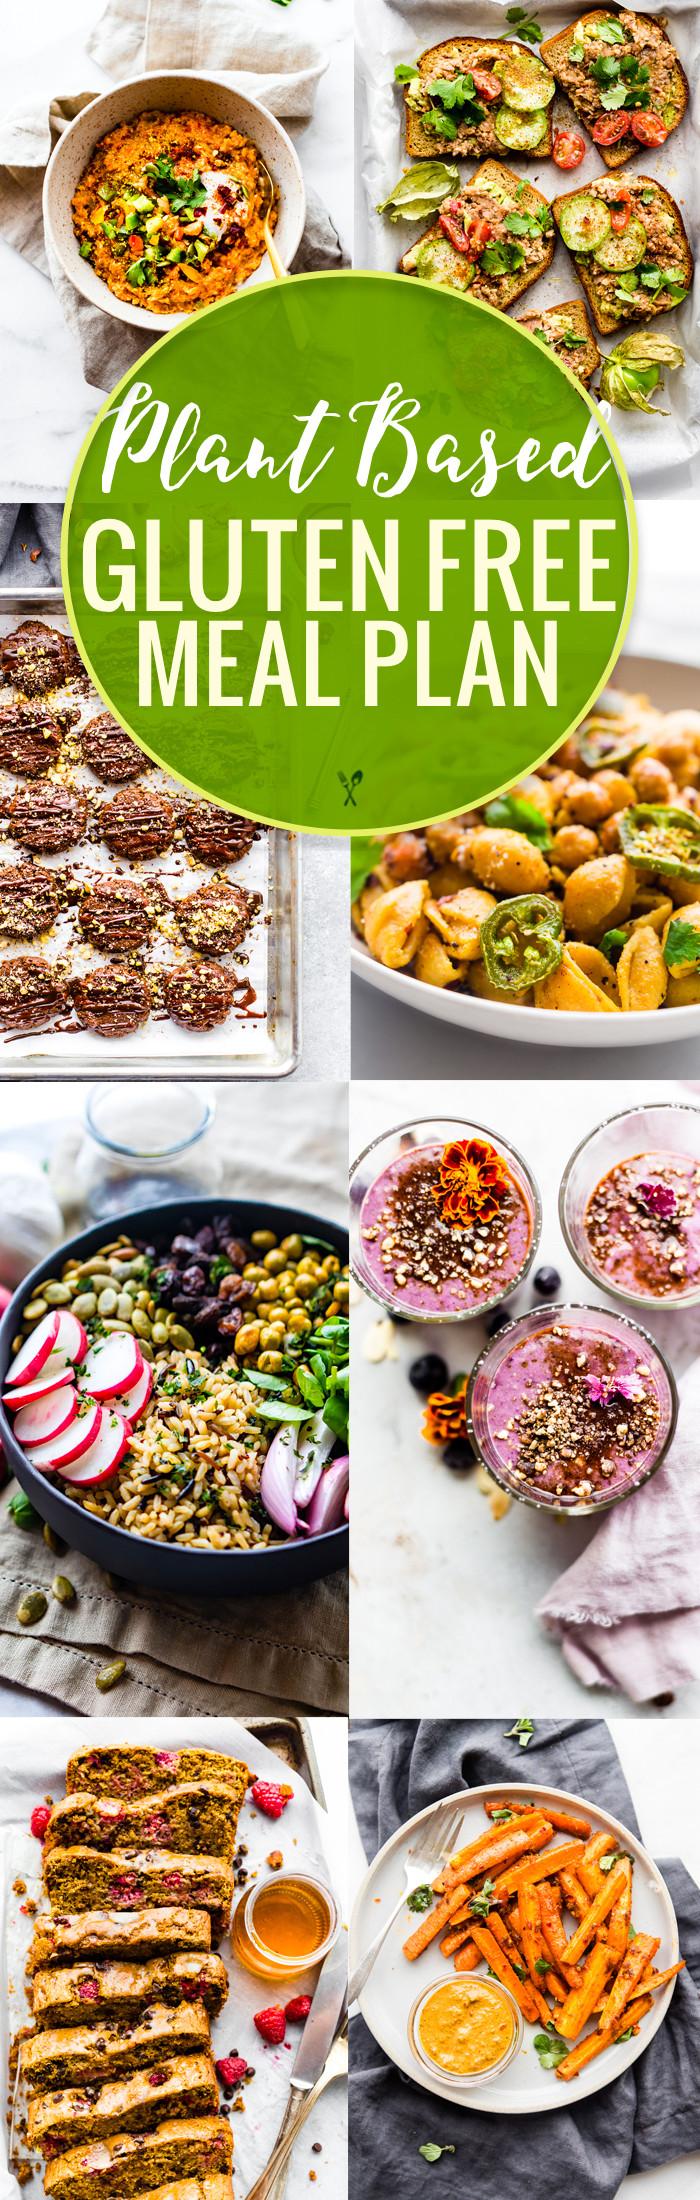 Gluten Free Dinners  Plant Based Gluten Free Meal Plan